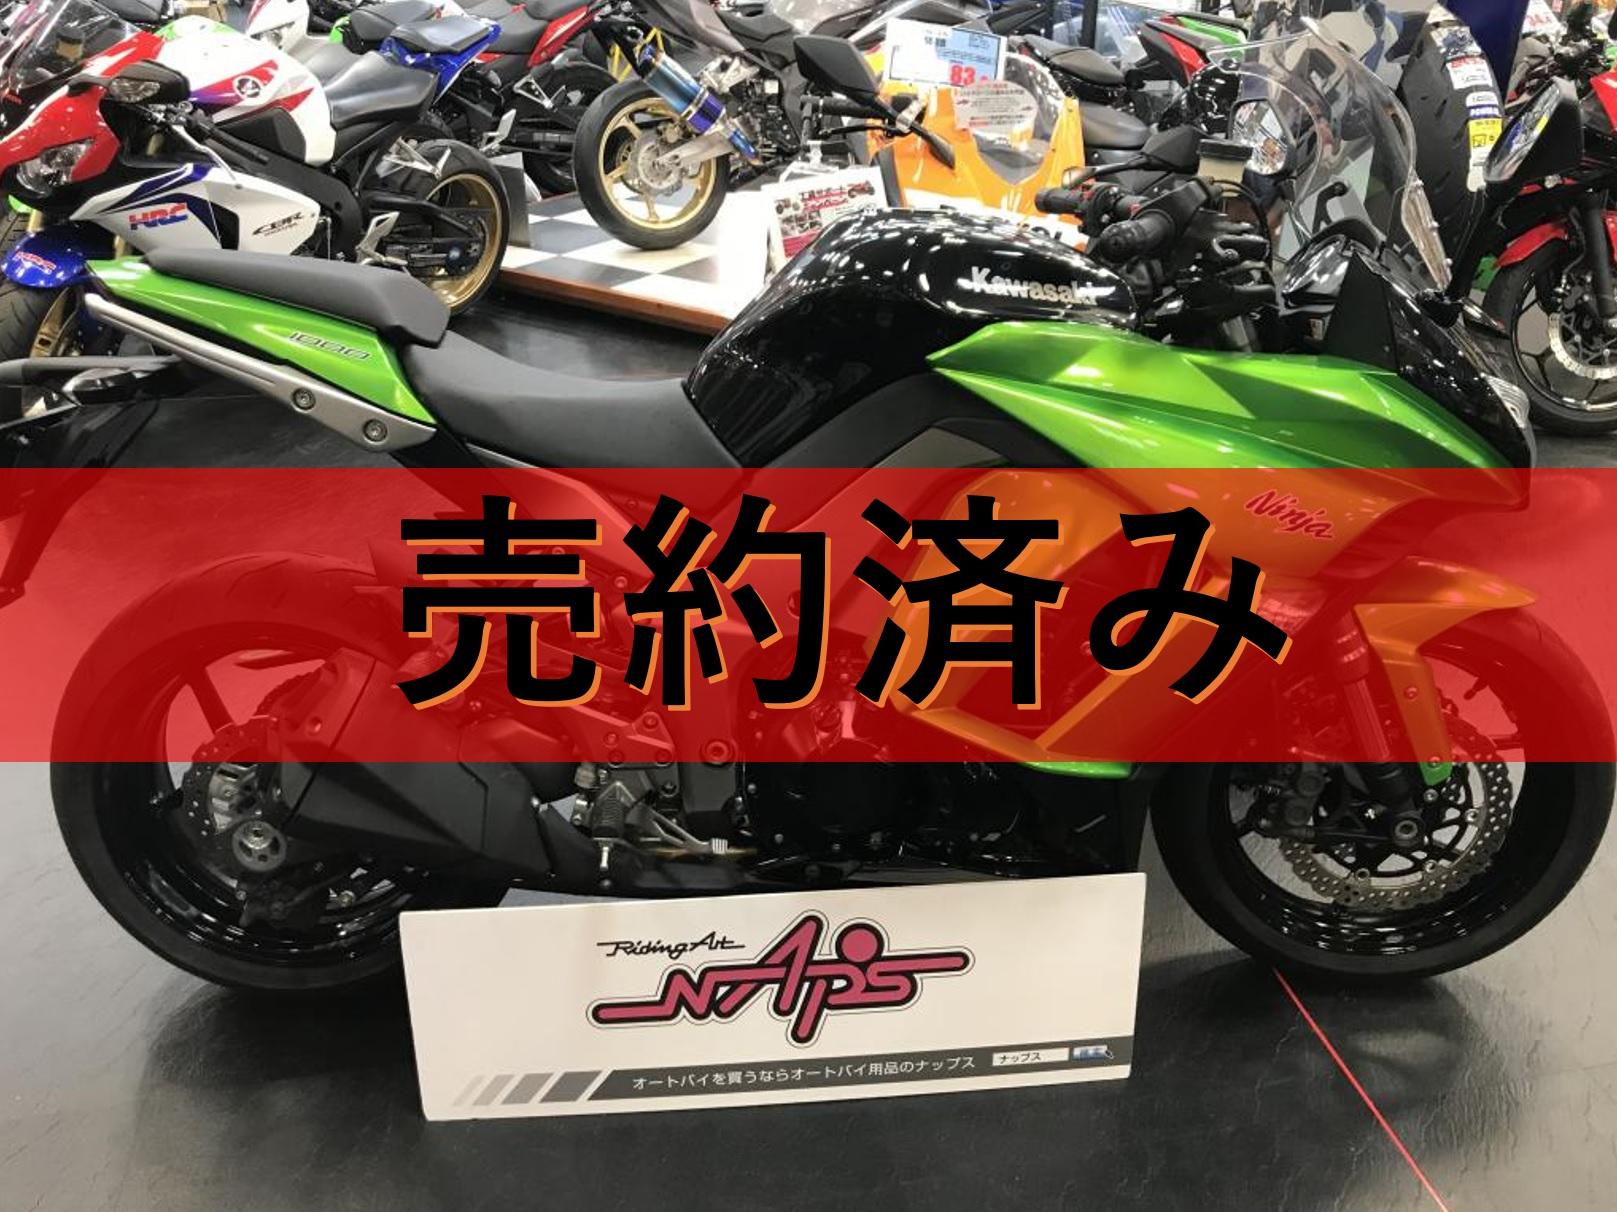 KAWASAKI 【販売車両】KAWASAKI NINJA1000 ブライト正規 ヘルメットホルダー